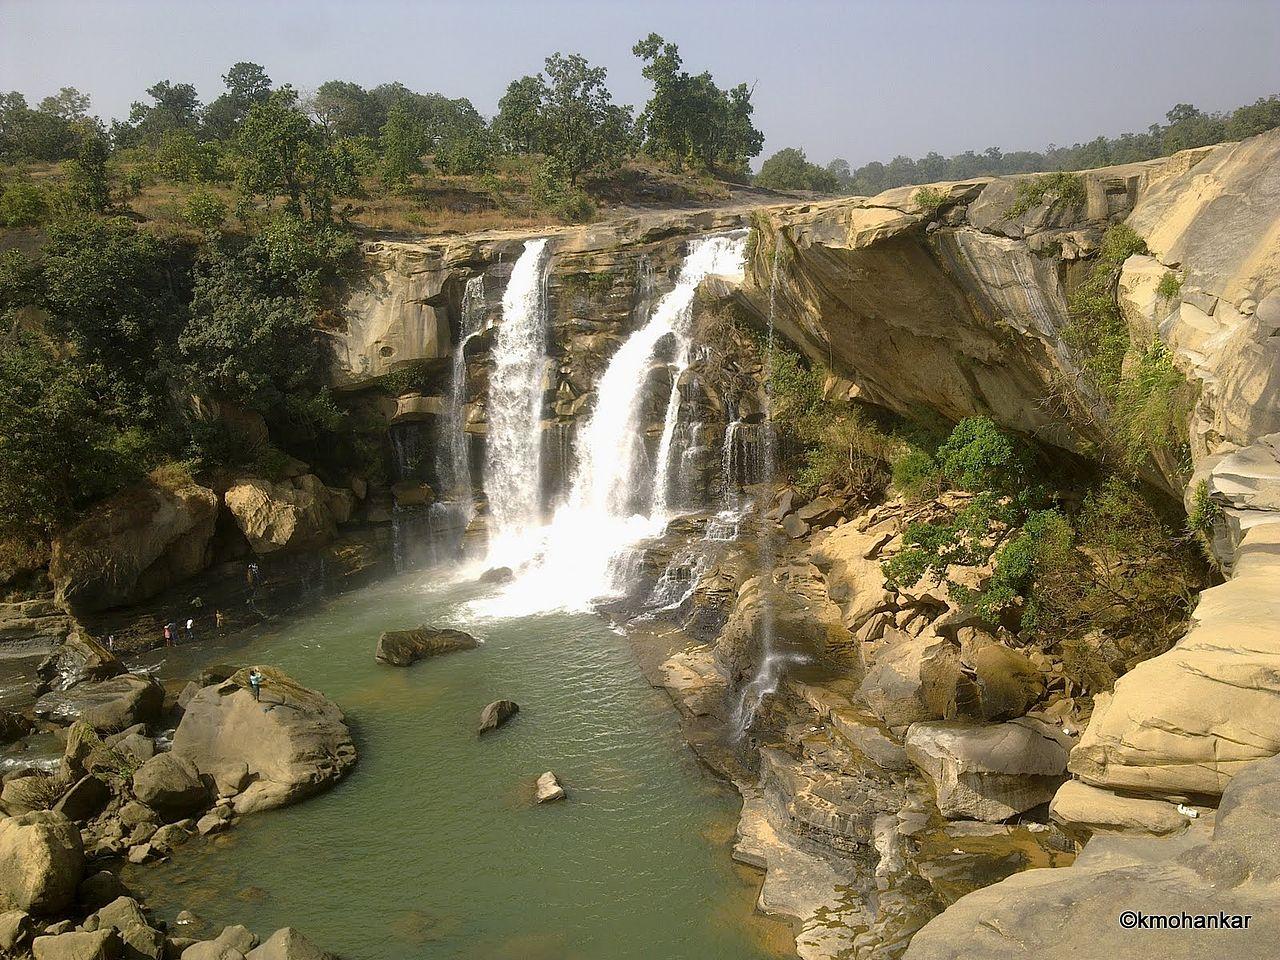 Amritdhara Waterfall on Hasdeo River in Koriya Distt Chhattisgarh panoramio Kailash Mohankar wikiccby30